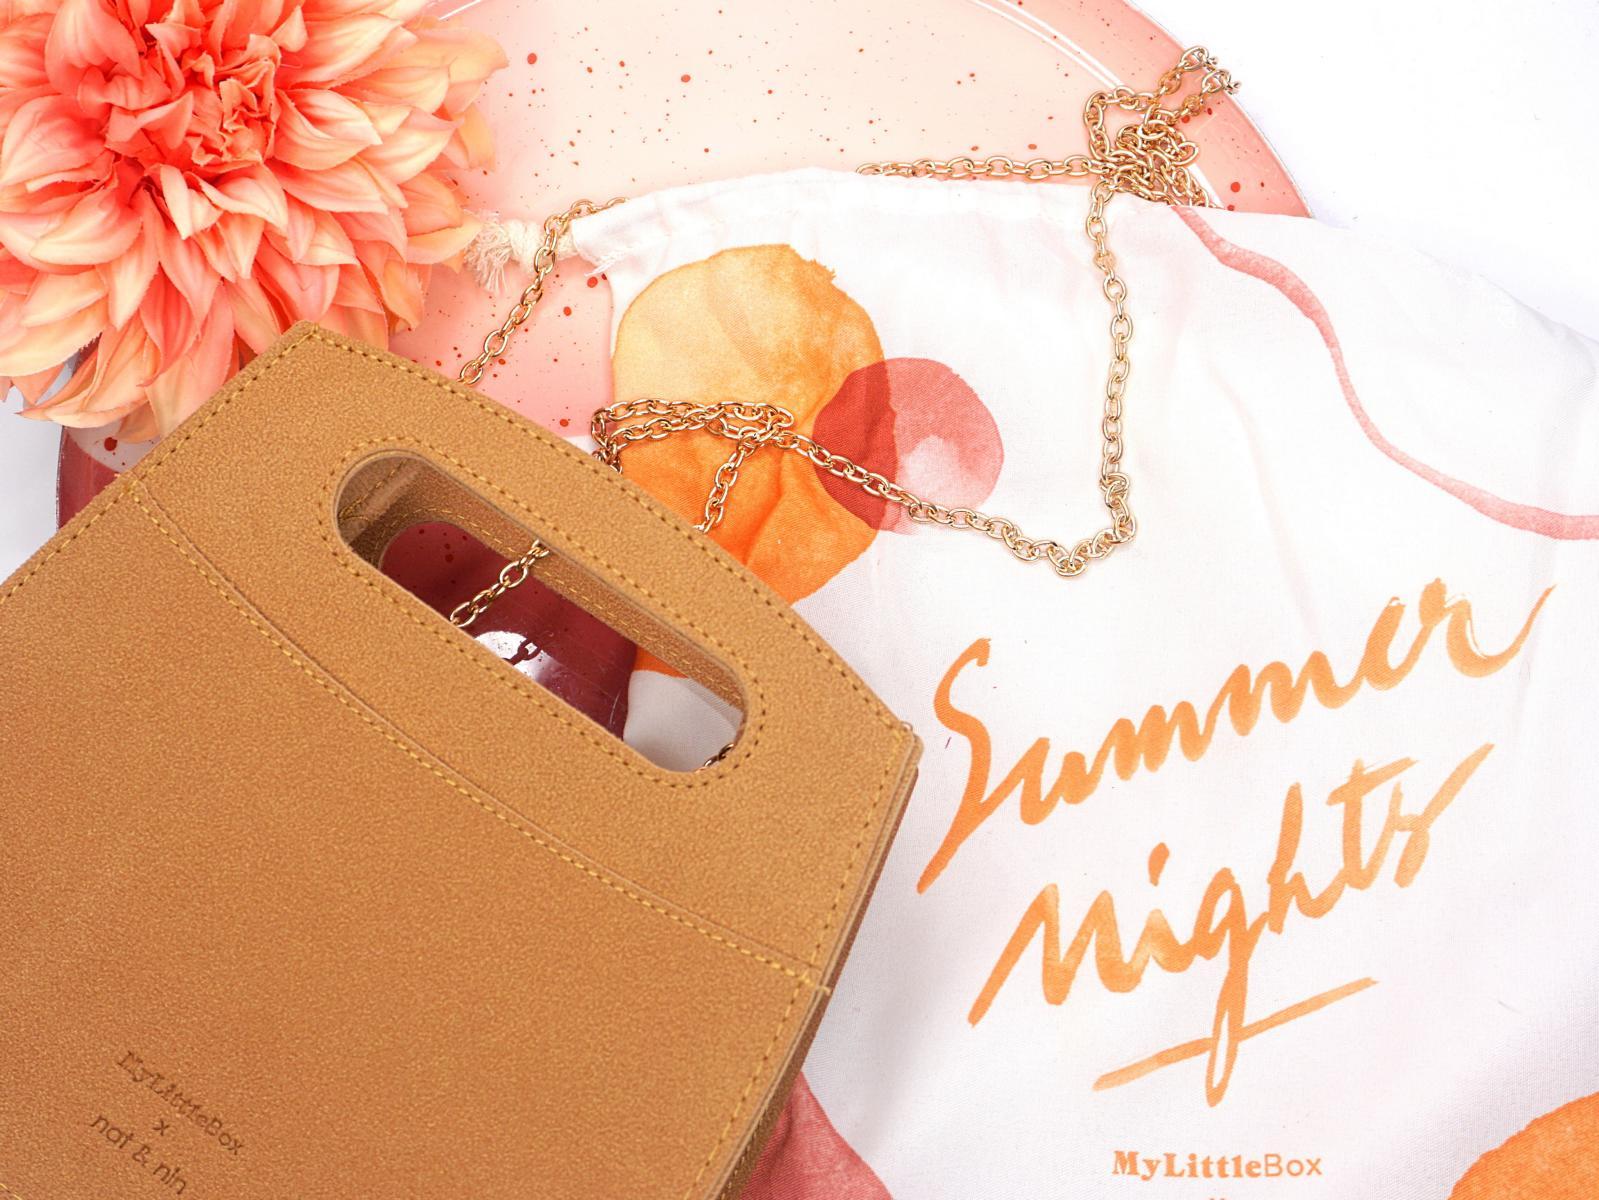 My Little Box Summer Nights